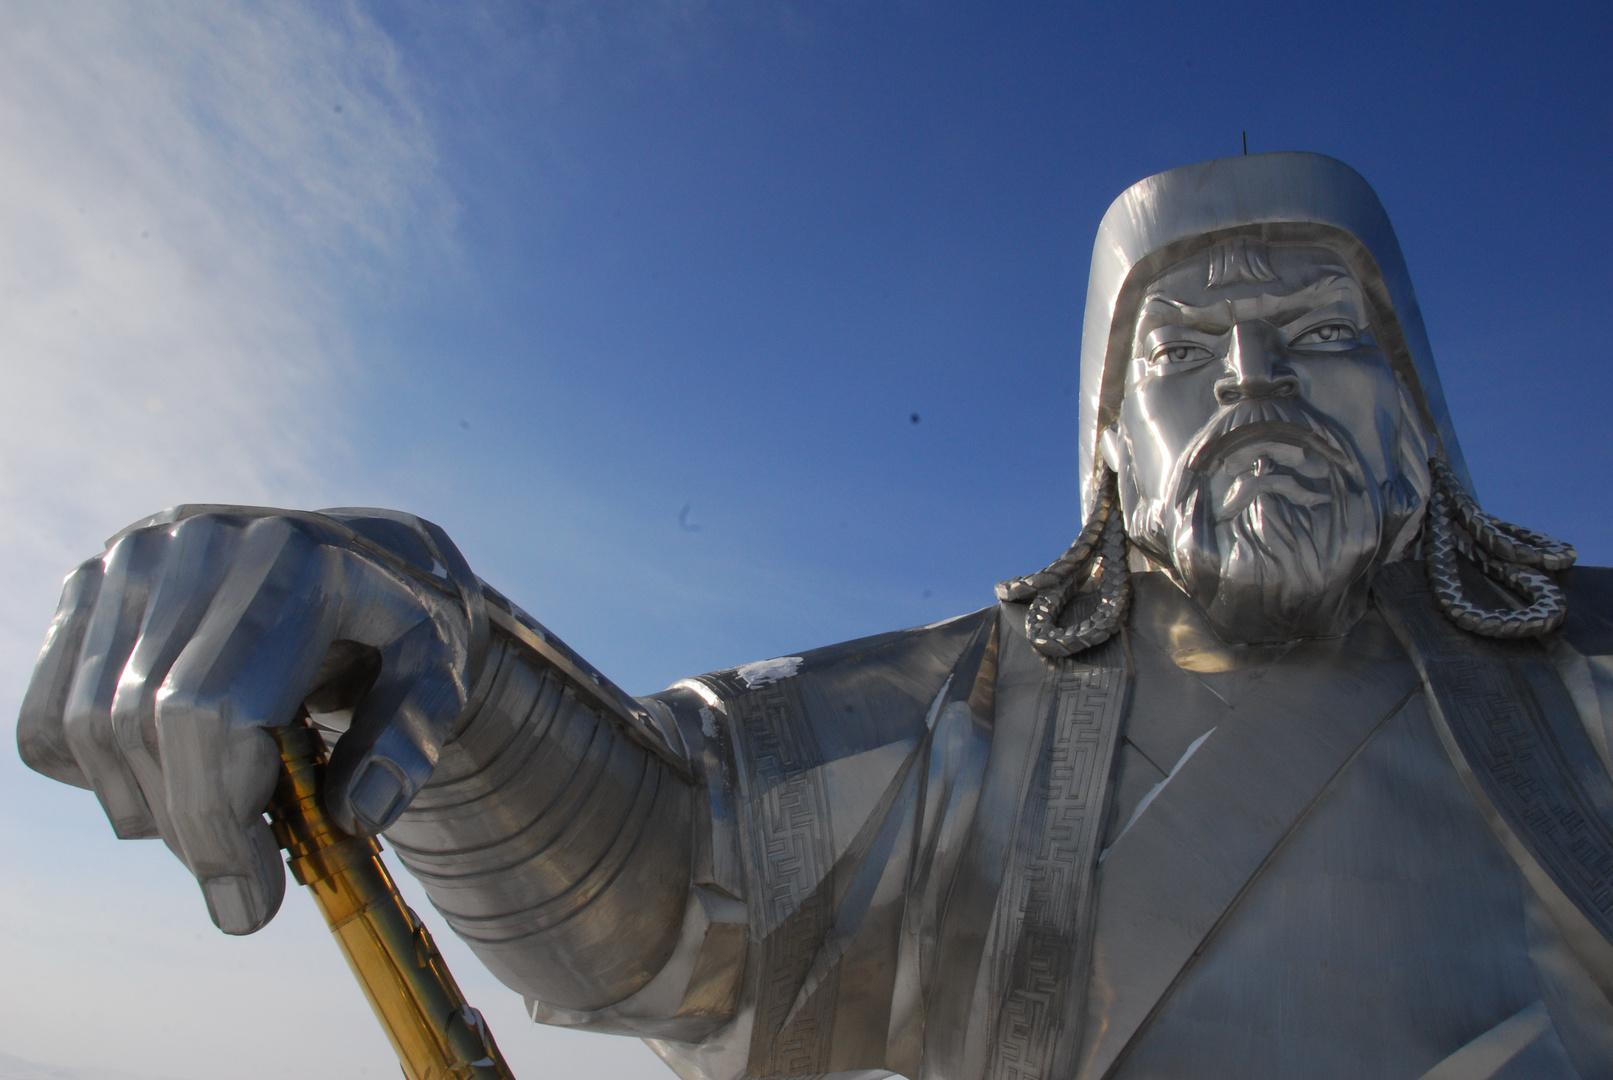 Denn wir sind Mongolen...